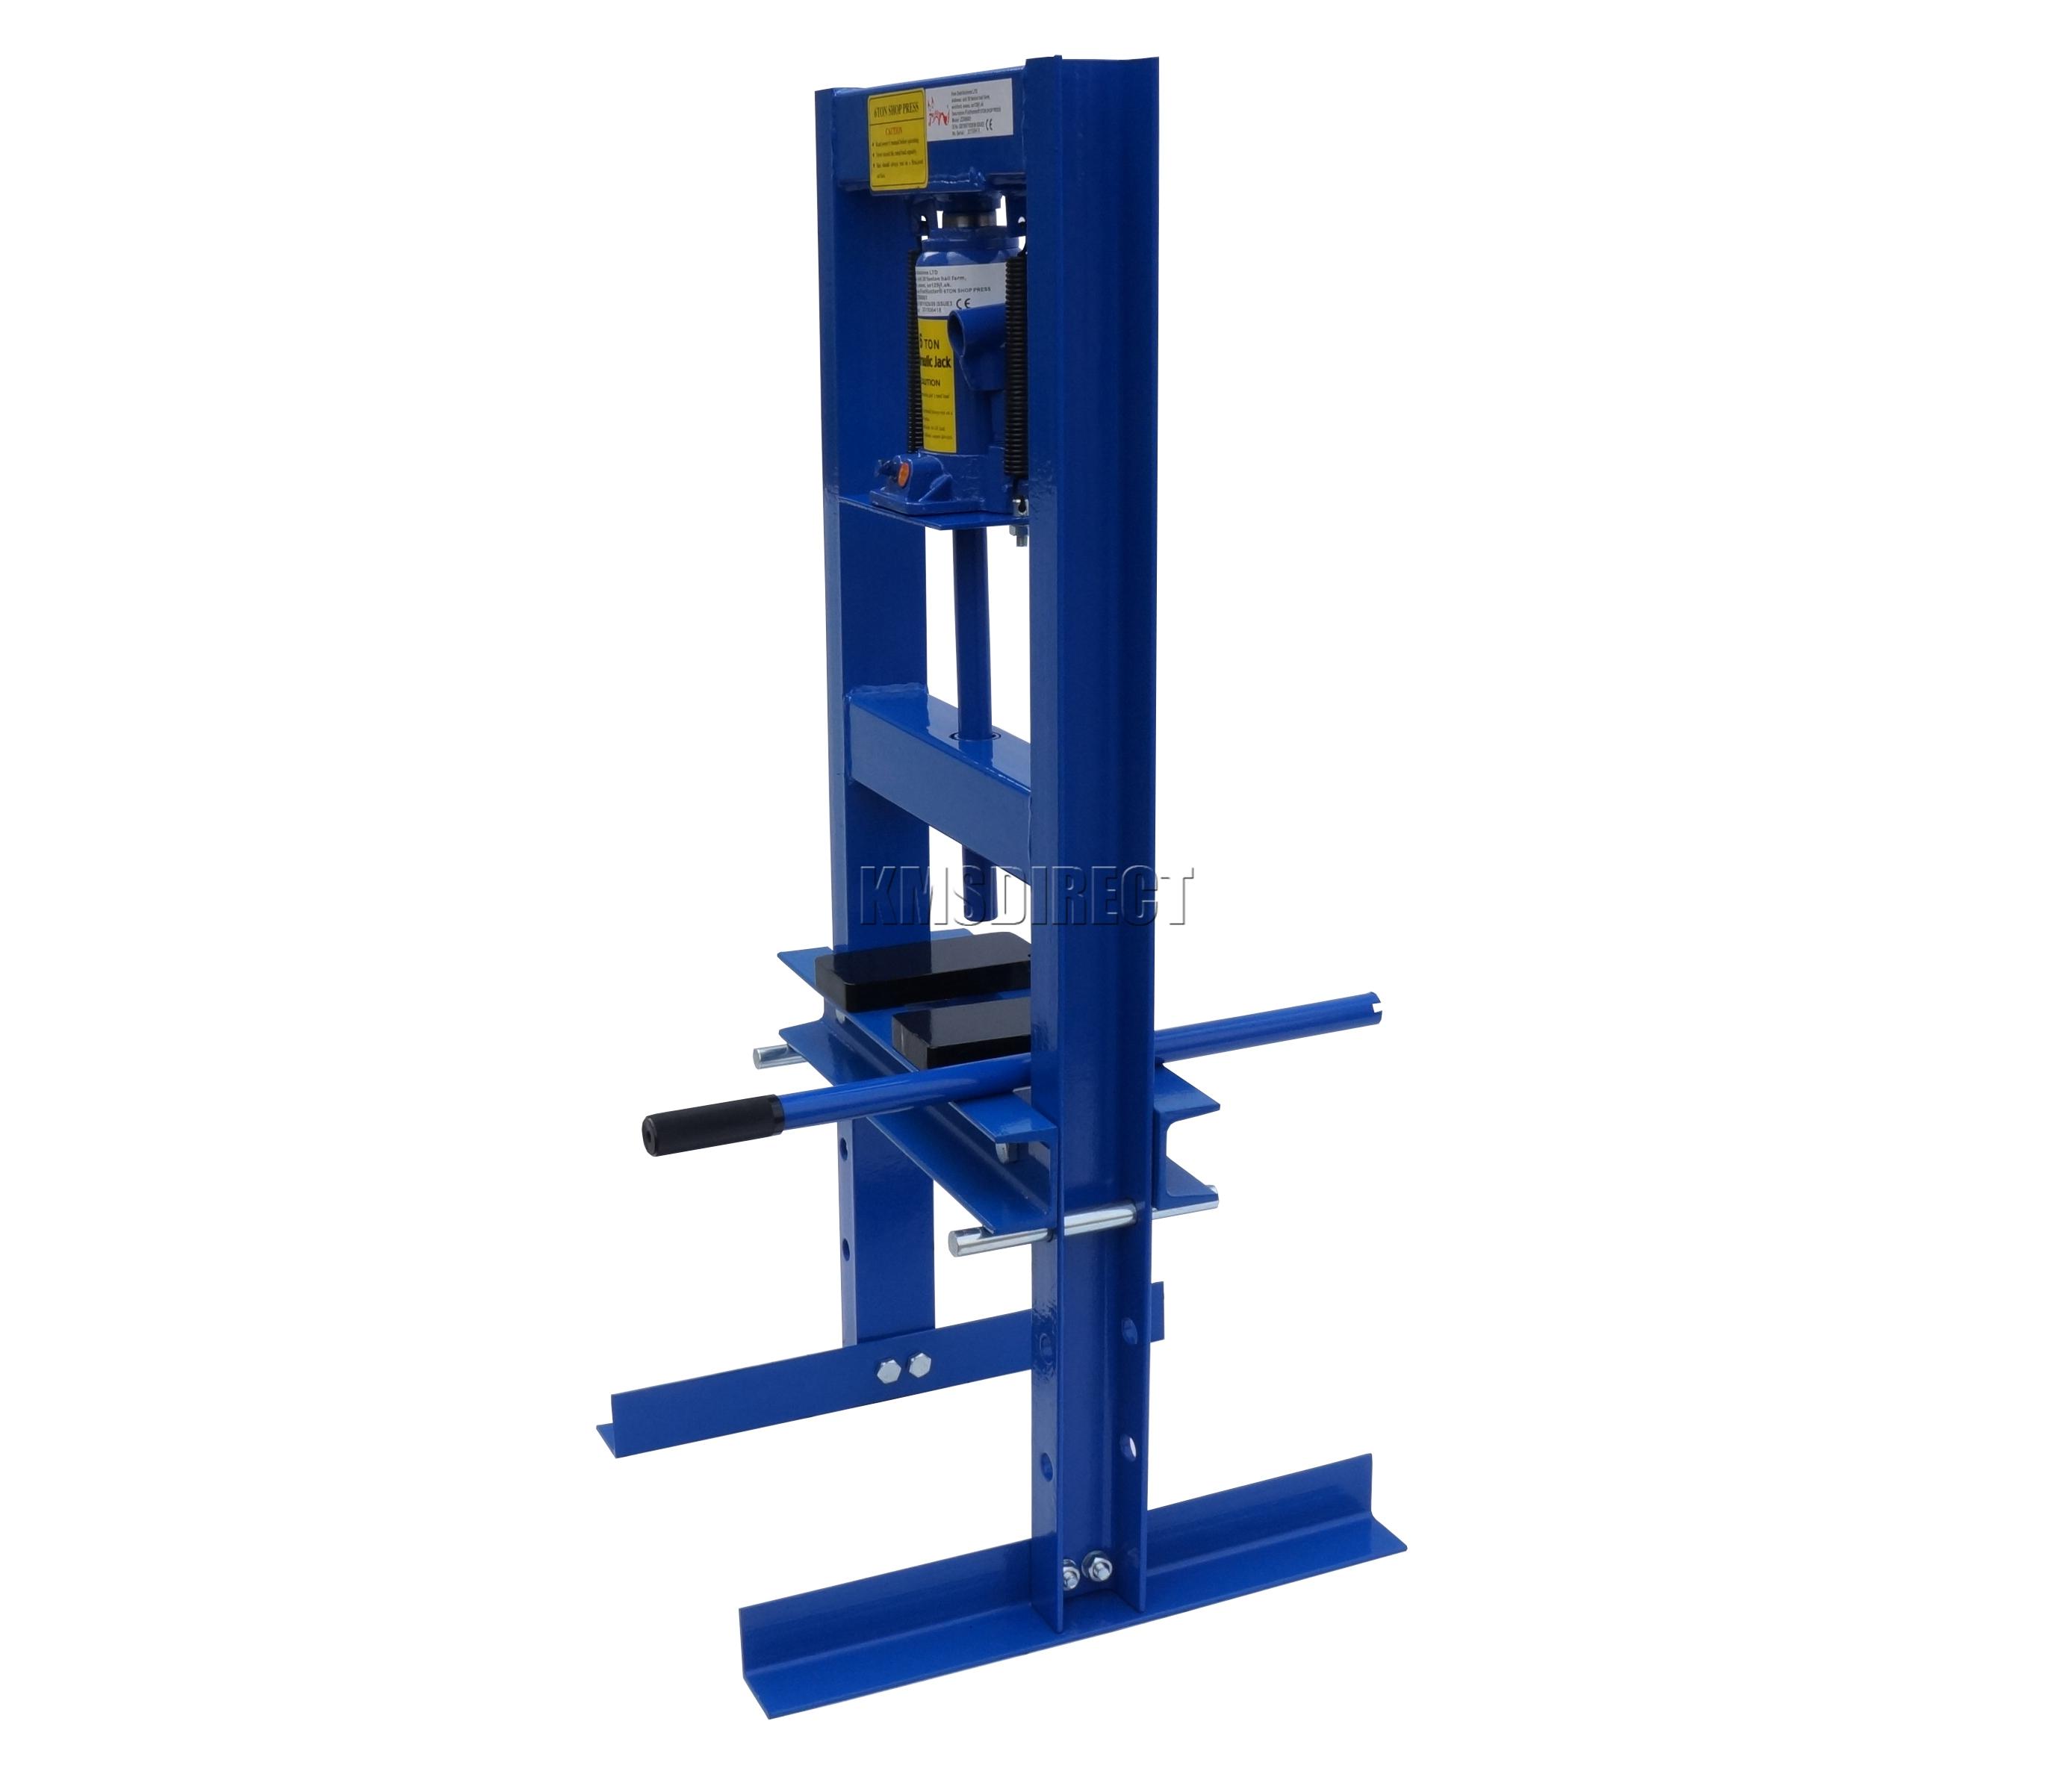 Foxhunter 6 Ton Tonne Hydraulic Garage Workshop Shop Press